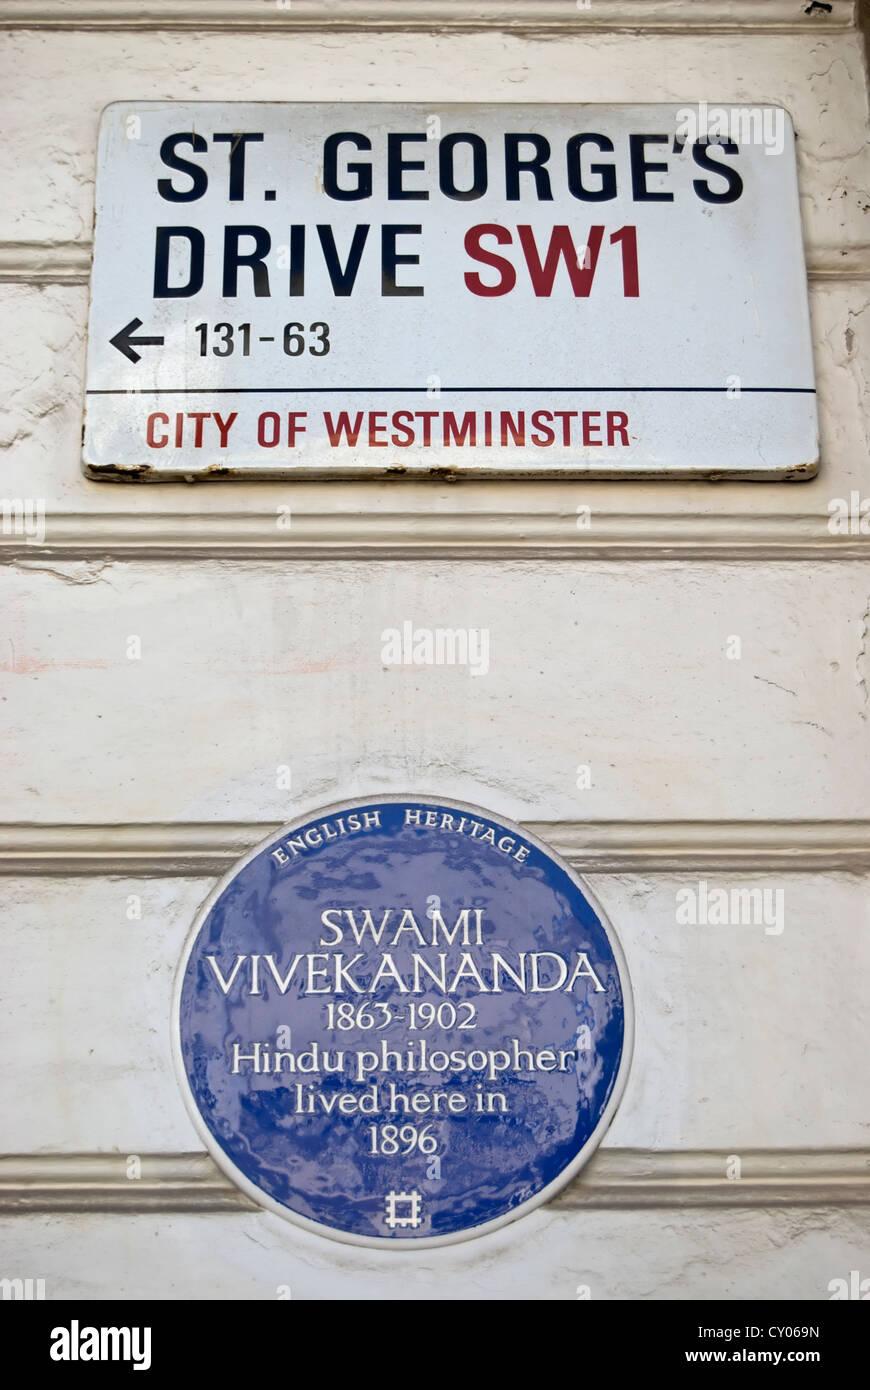 english heritage blue plaque marking the 1896 home of hindu philosopher, swami vivekananda, below street name sign - Stock Image